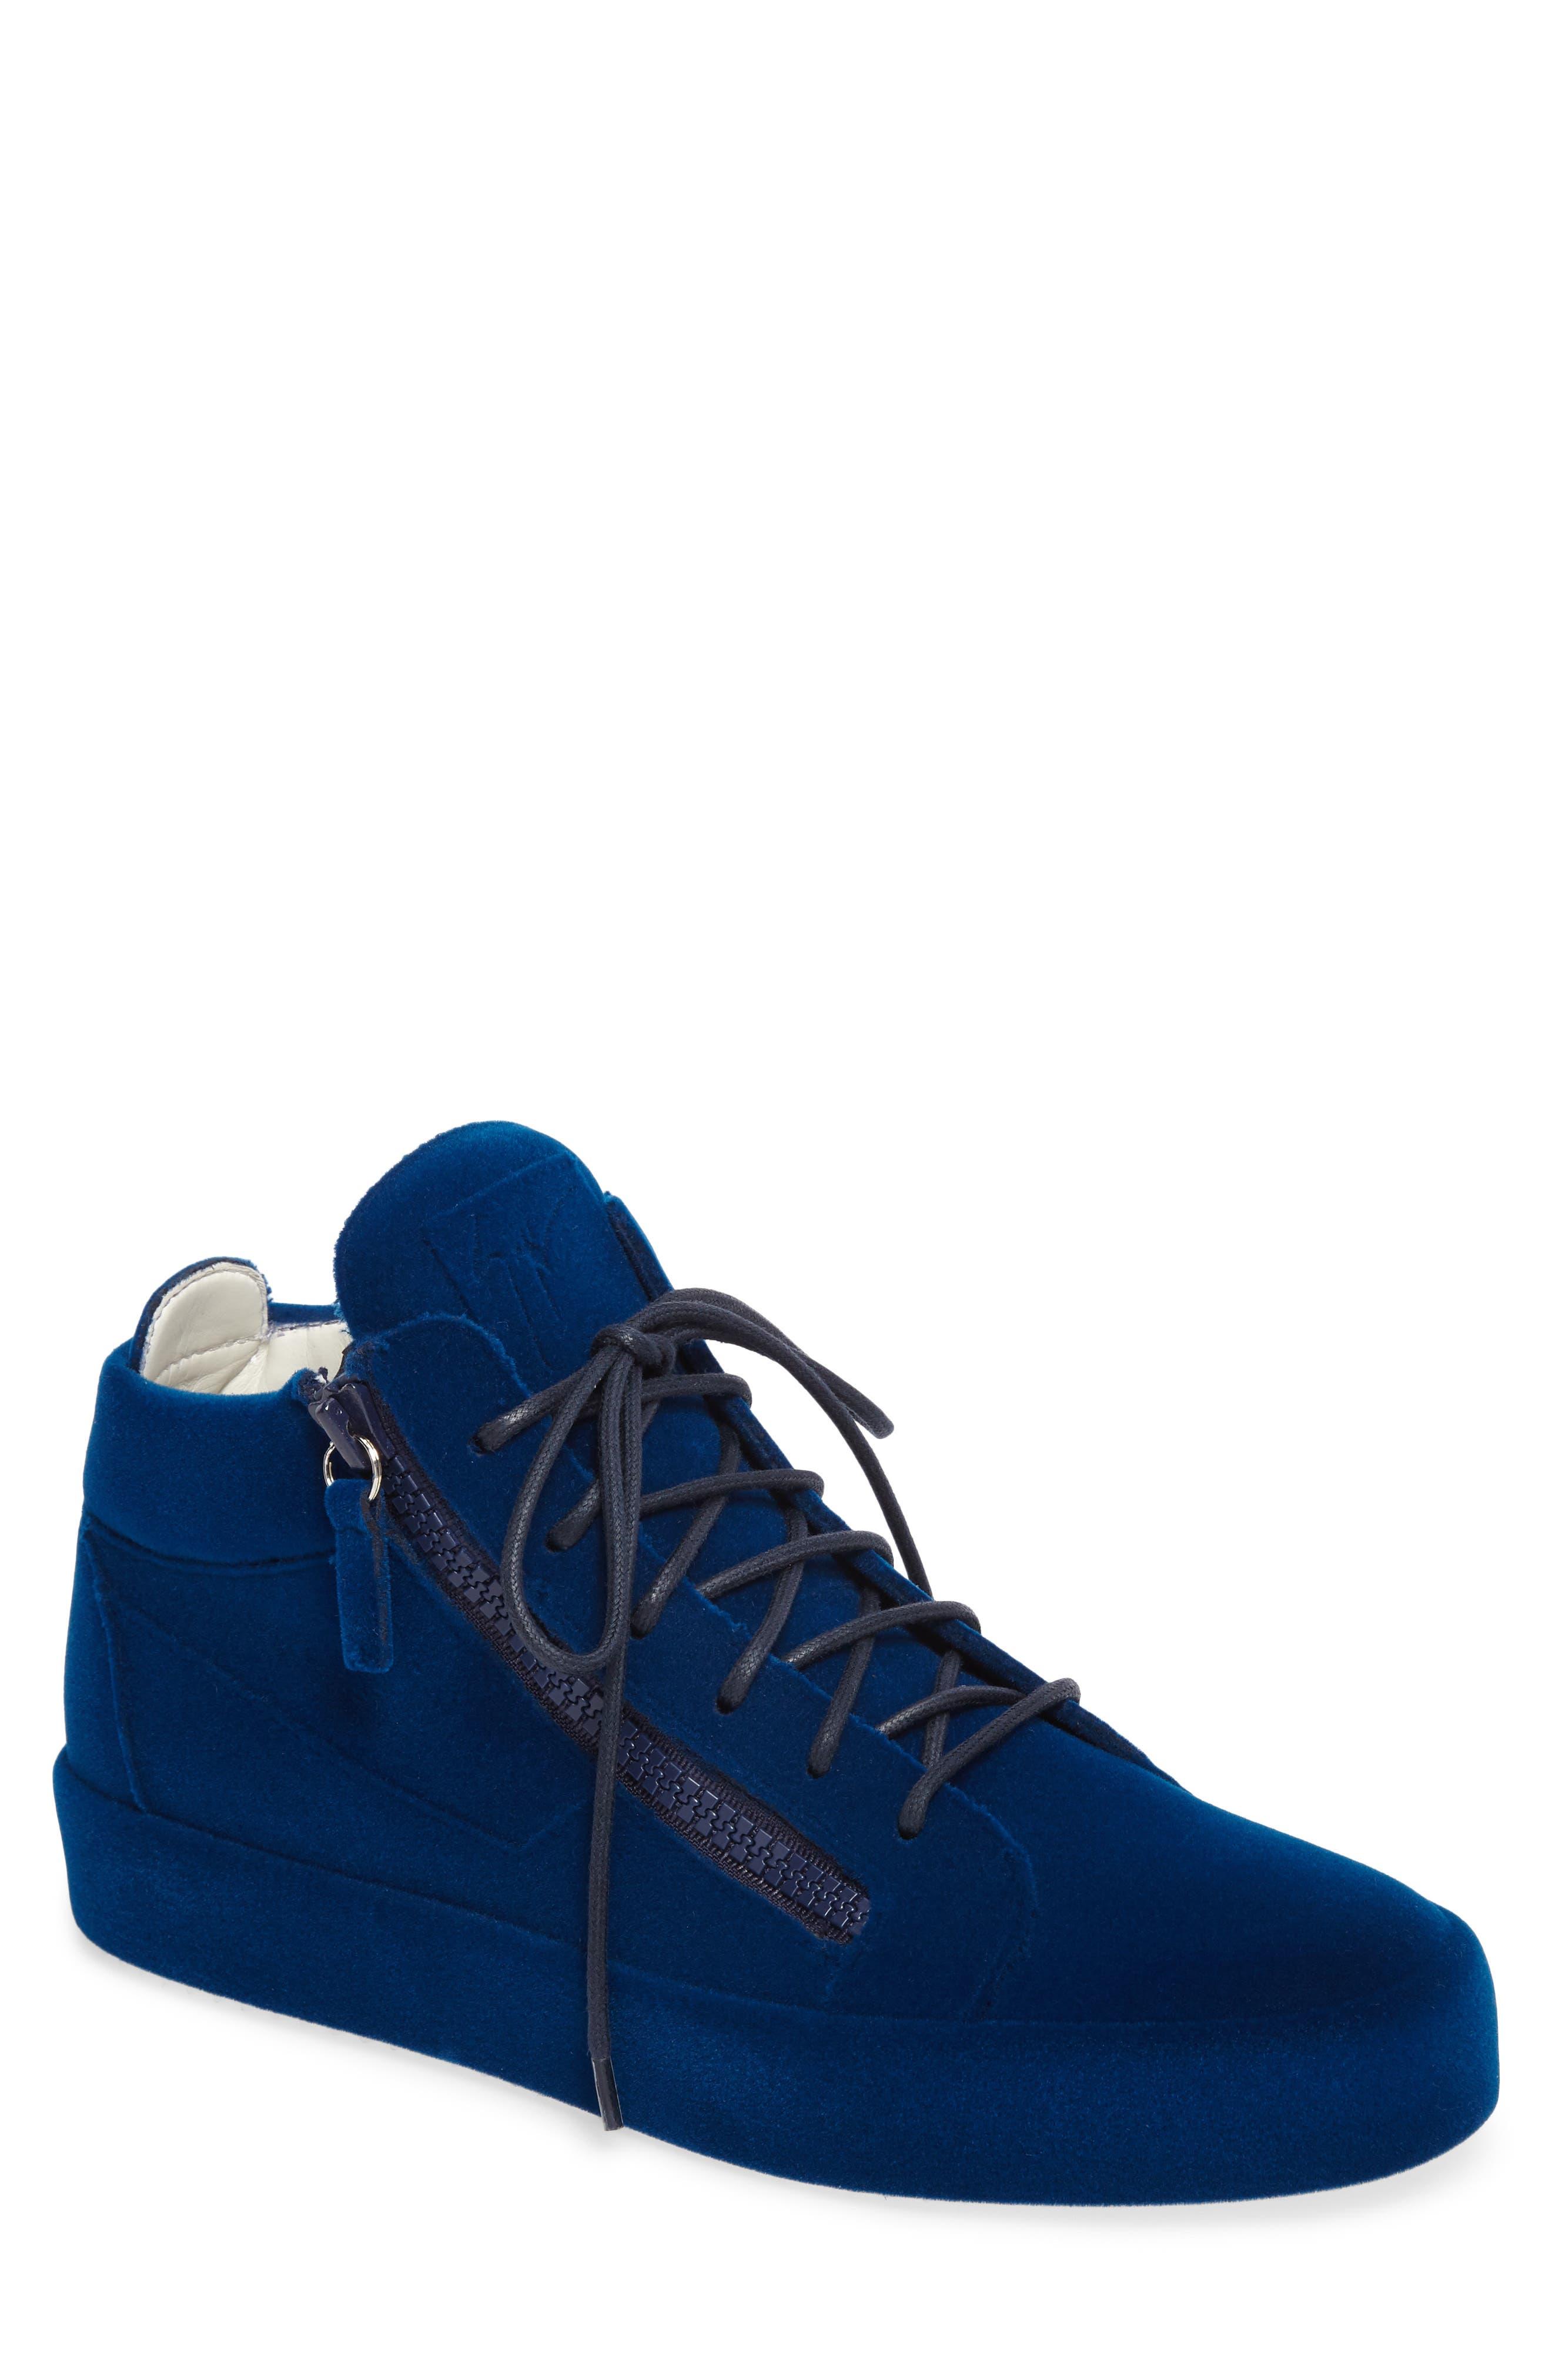 Mid Top Sneaker,                         Main,                         color, 469